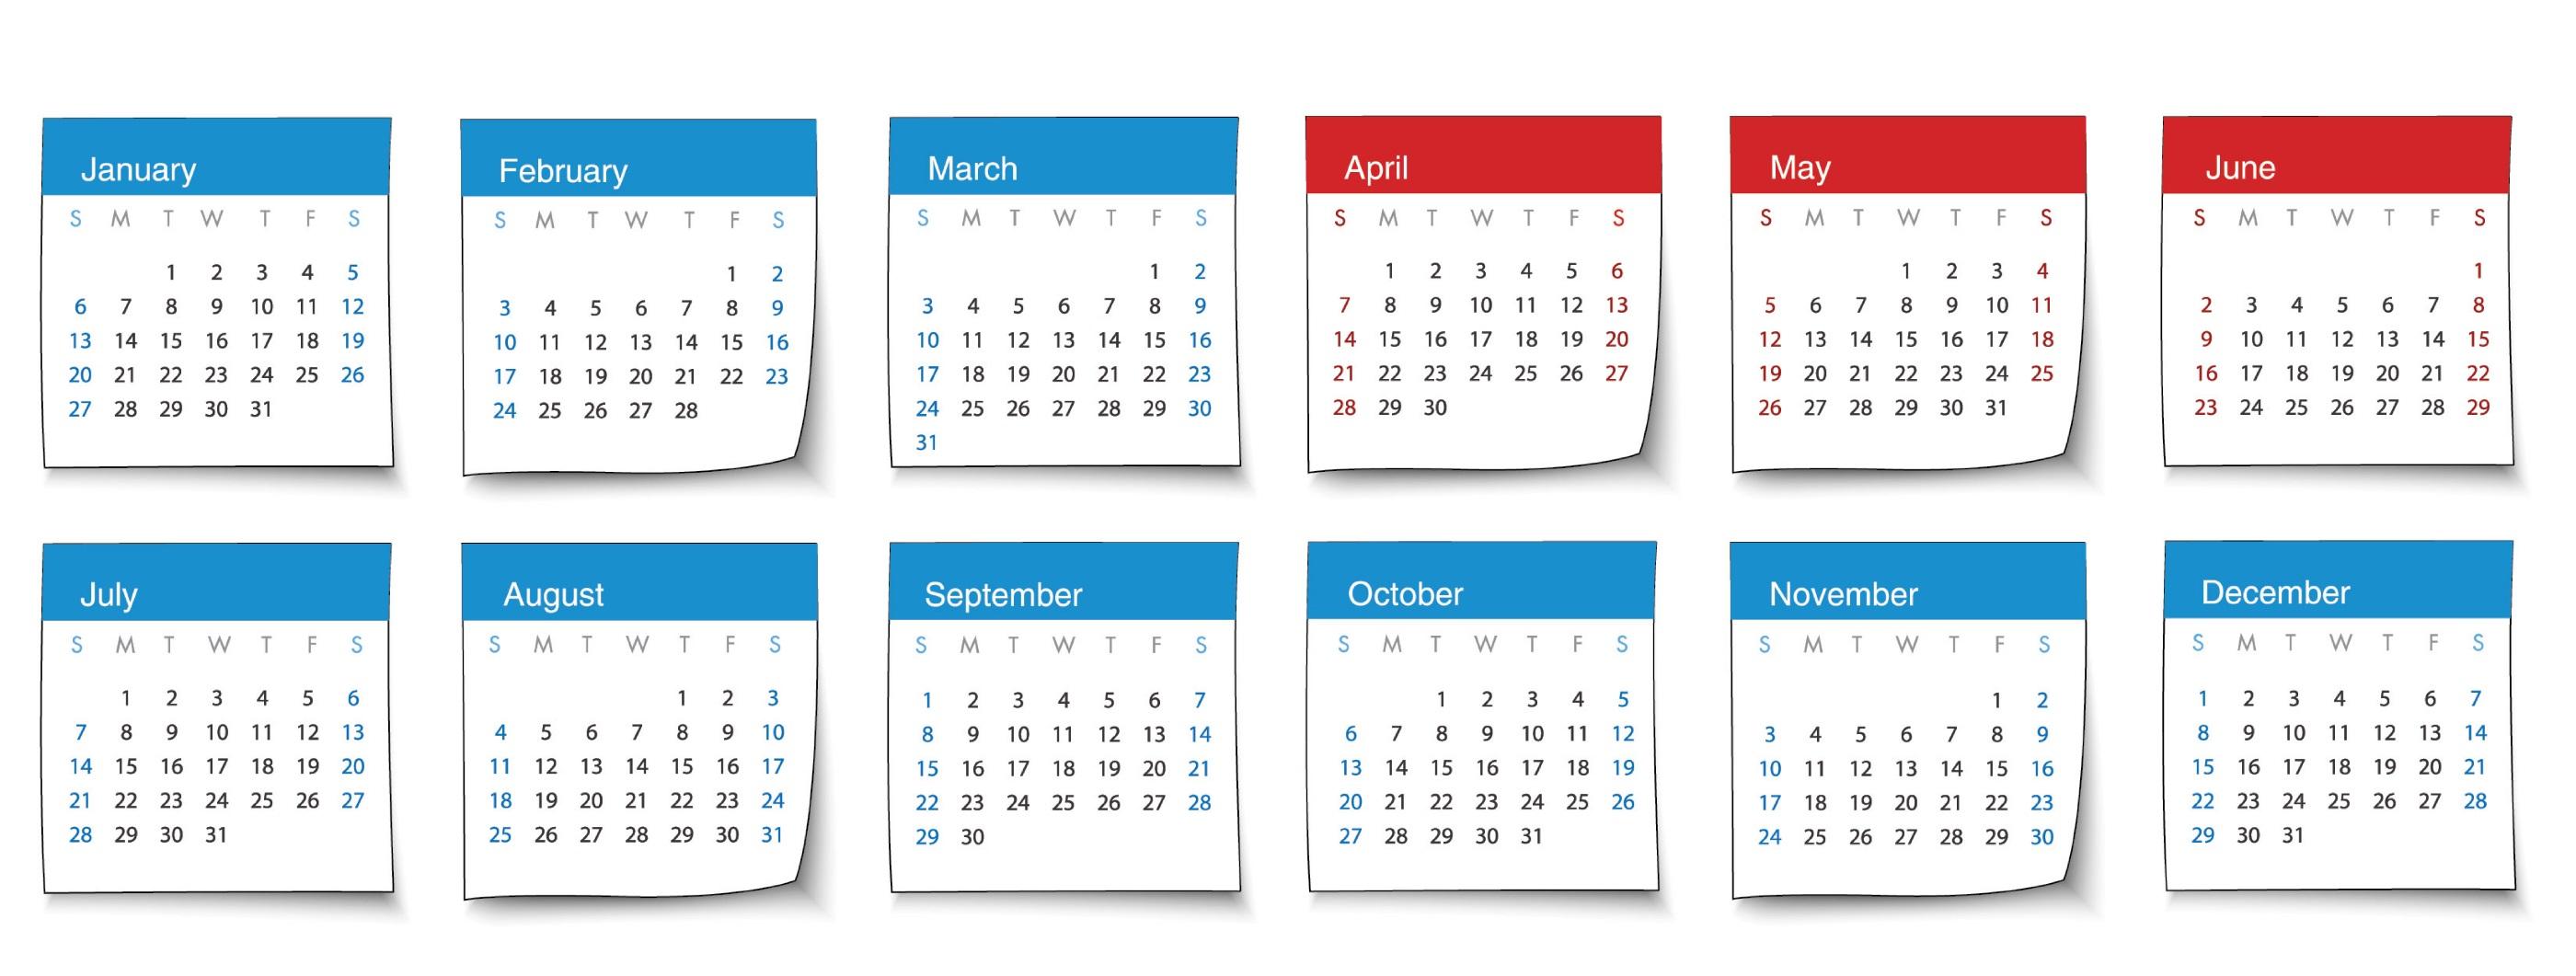 2019-02-11-Calendar-2019-ENG-MEM